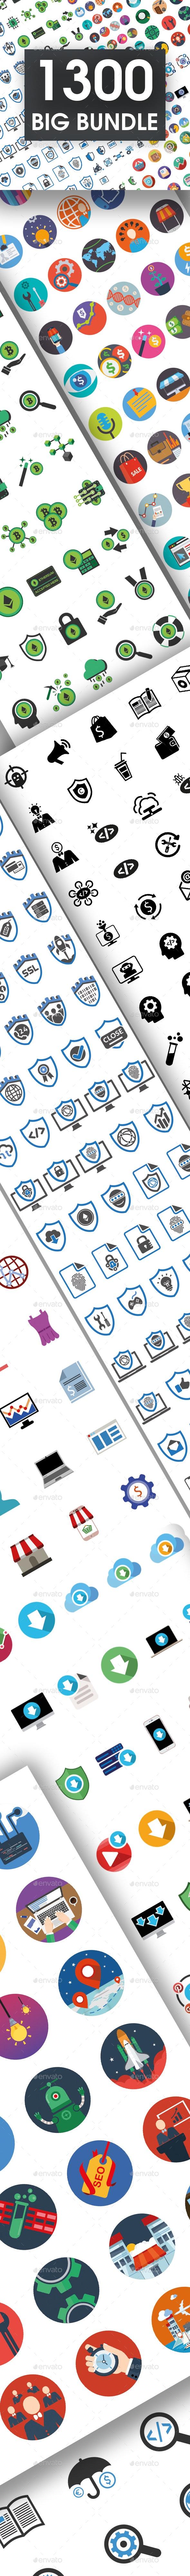 1300 Big Bundle Icons - Icons